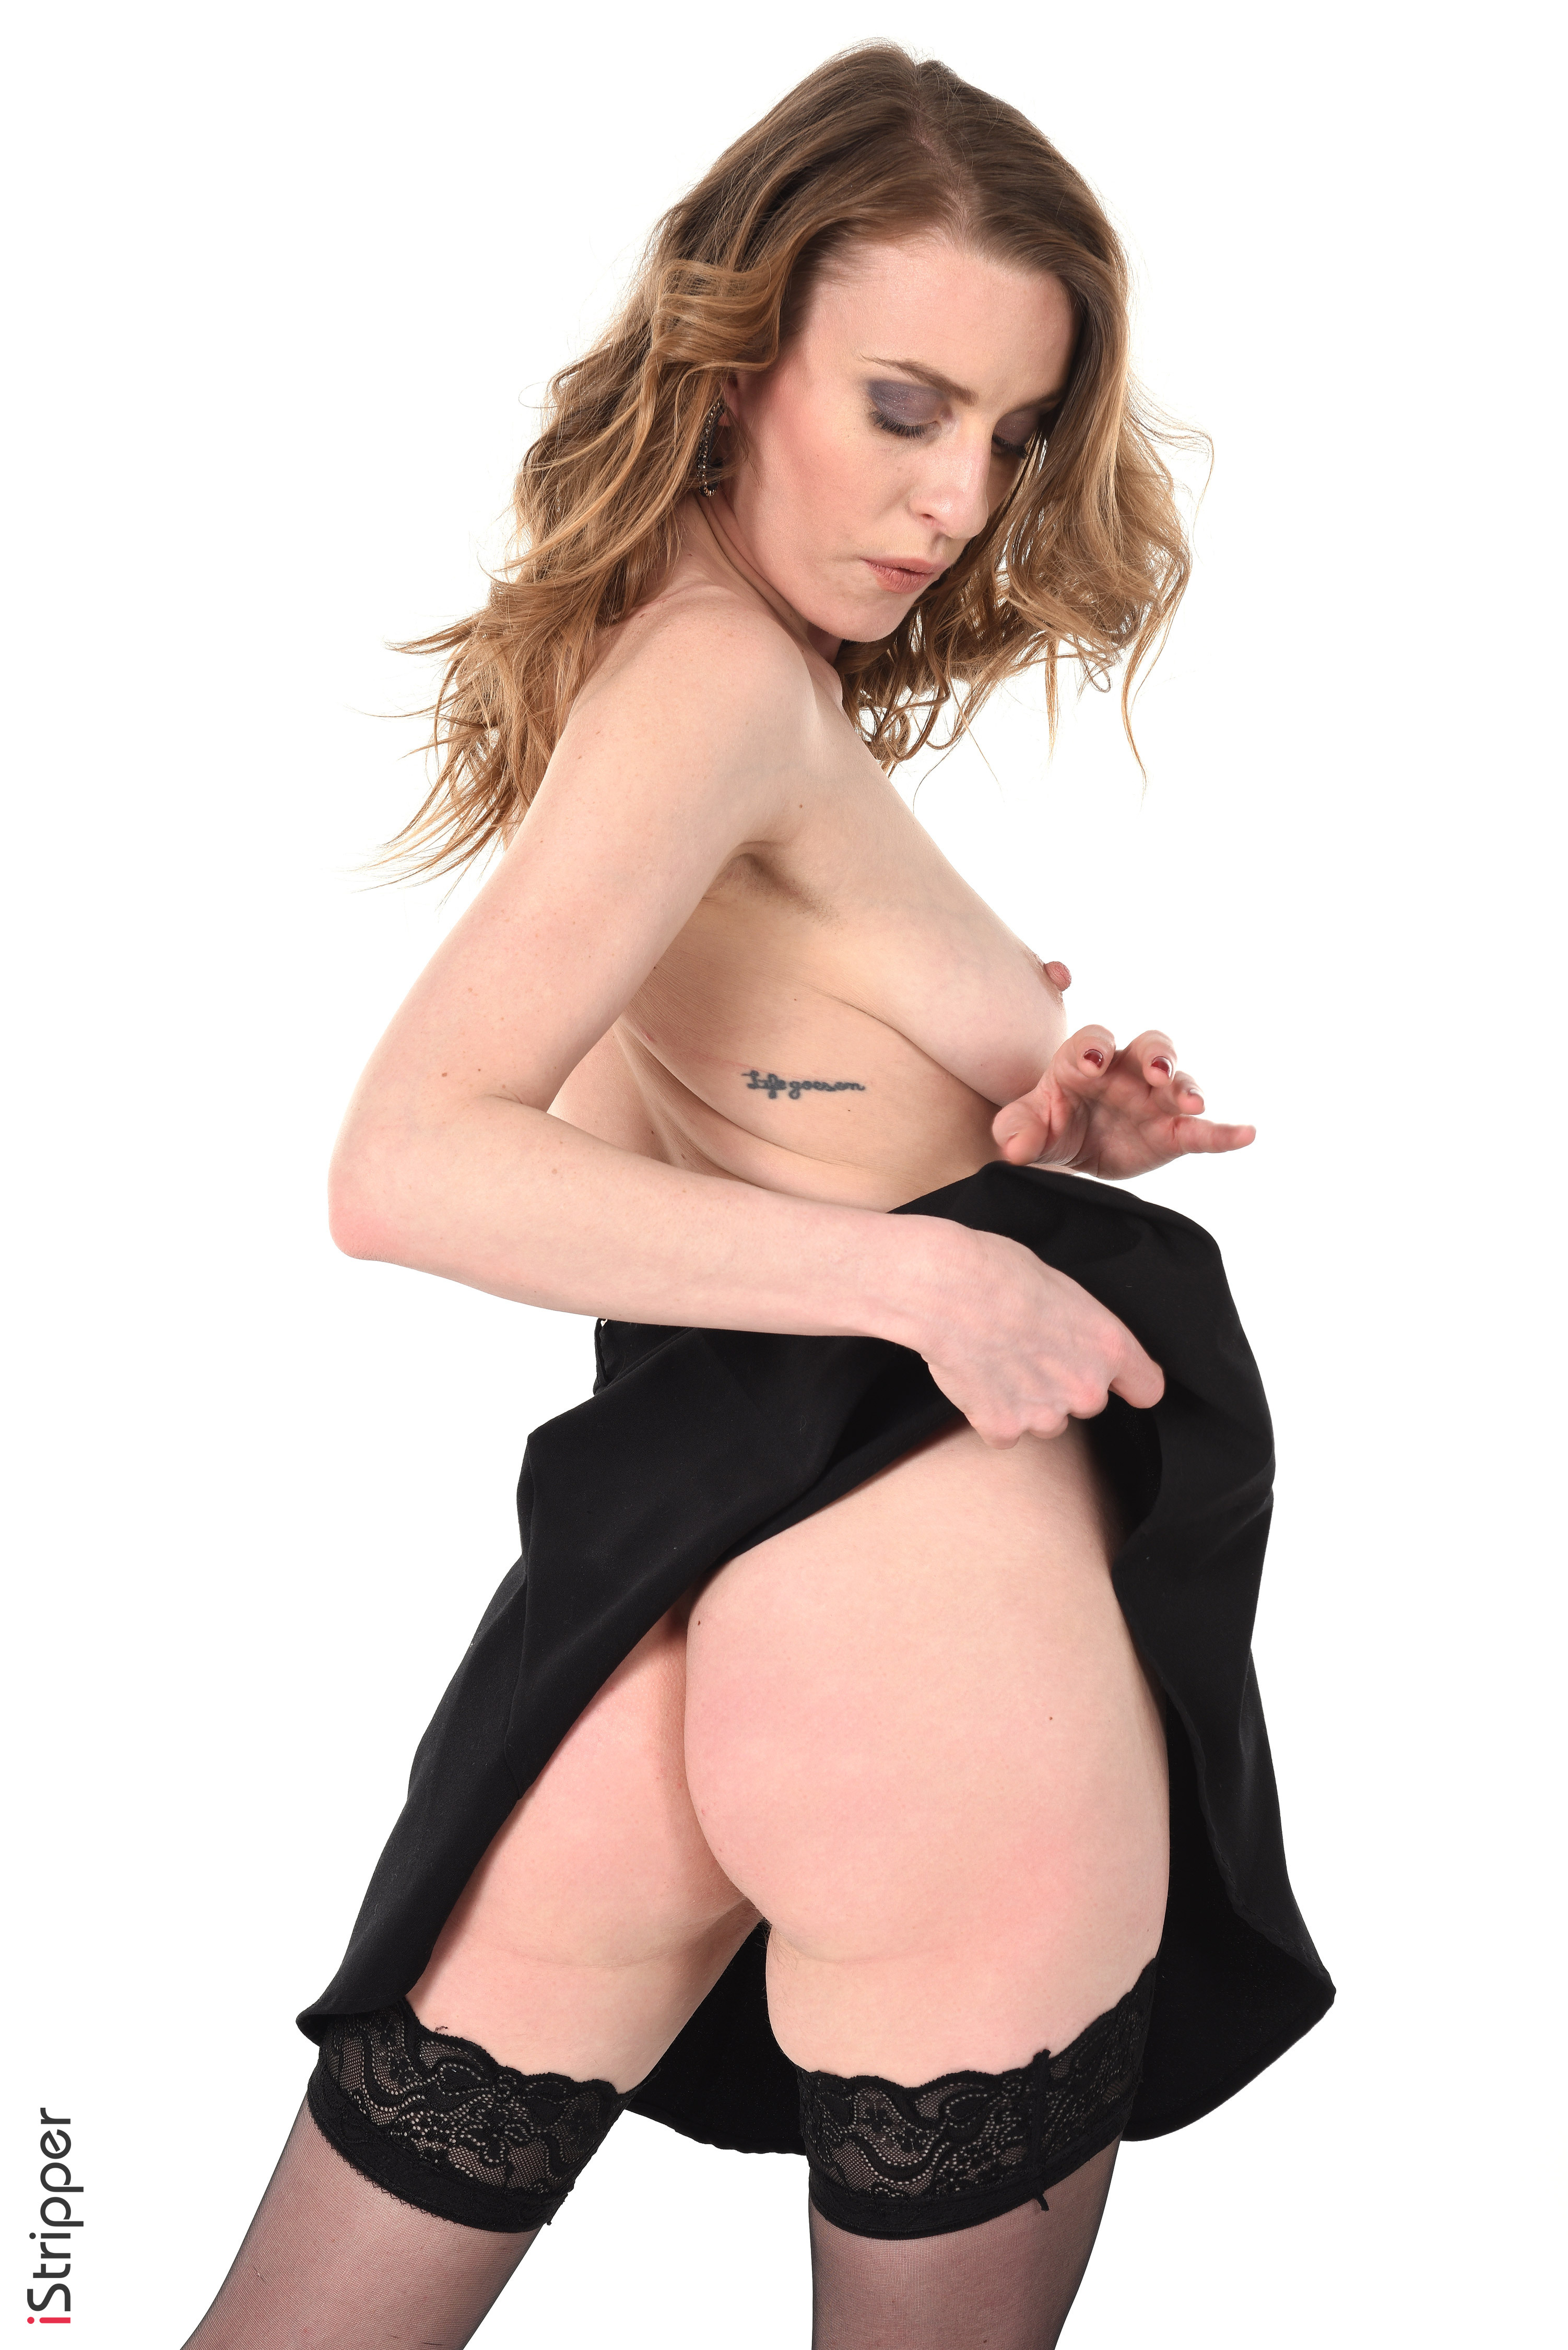 sexy chubby chicks striptease